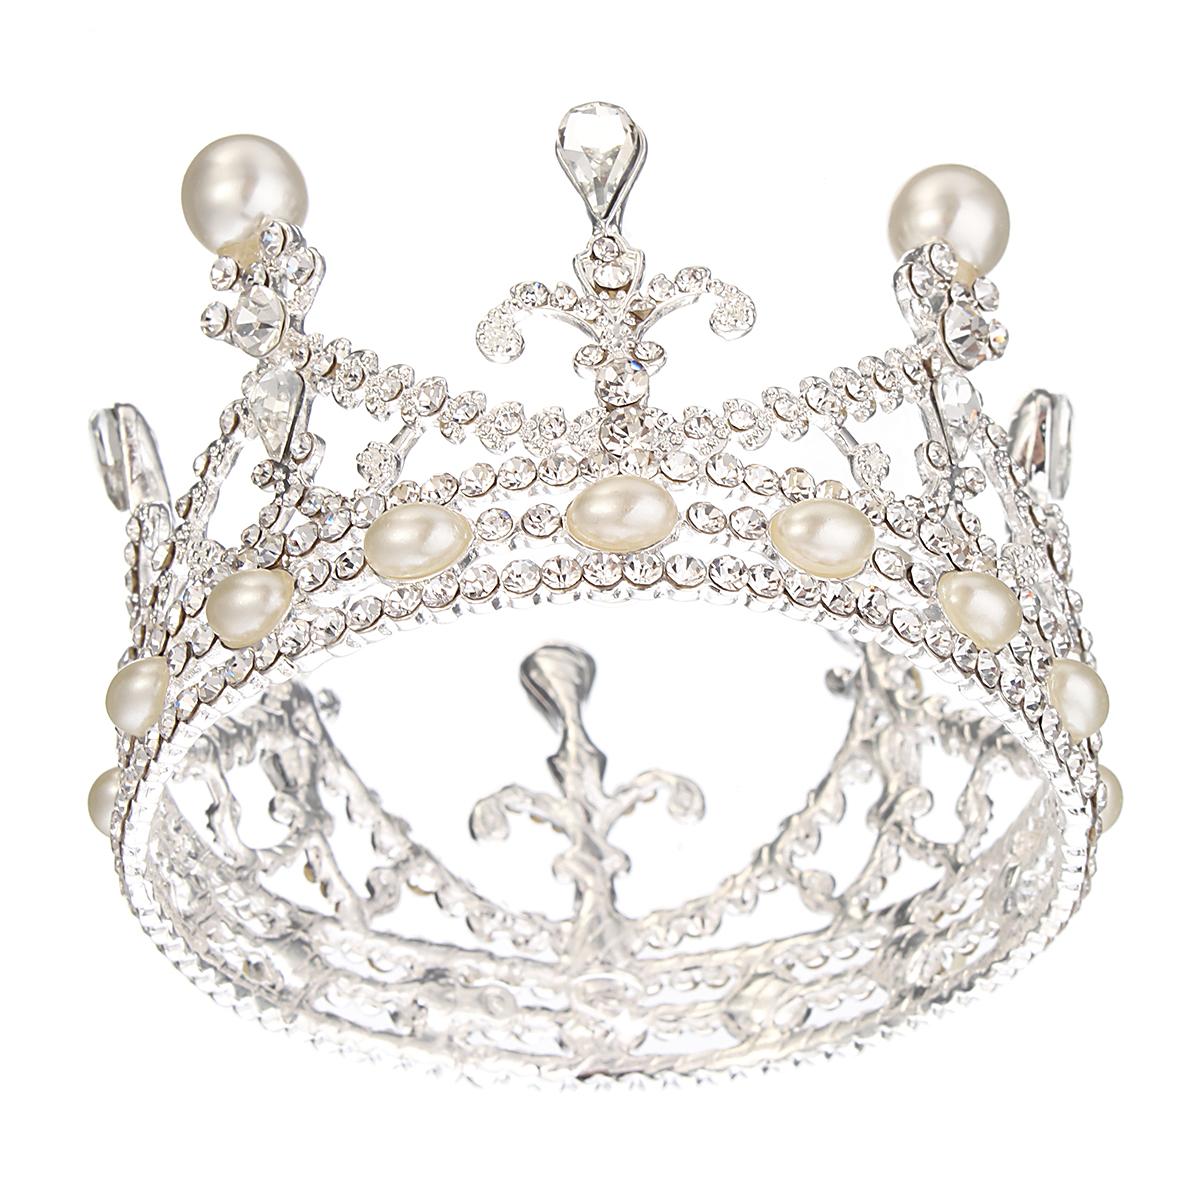 Bride Rhinestone Diamond Pearl Crown Tiara Head Jewelry Princess Queen Headpiece Wedding Accessories